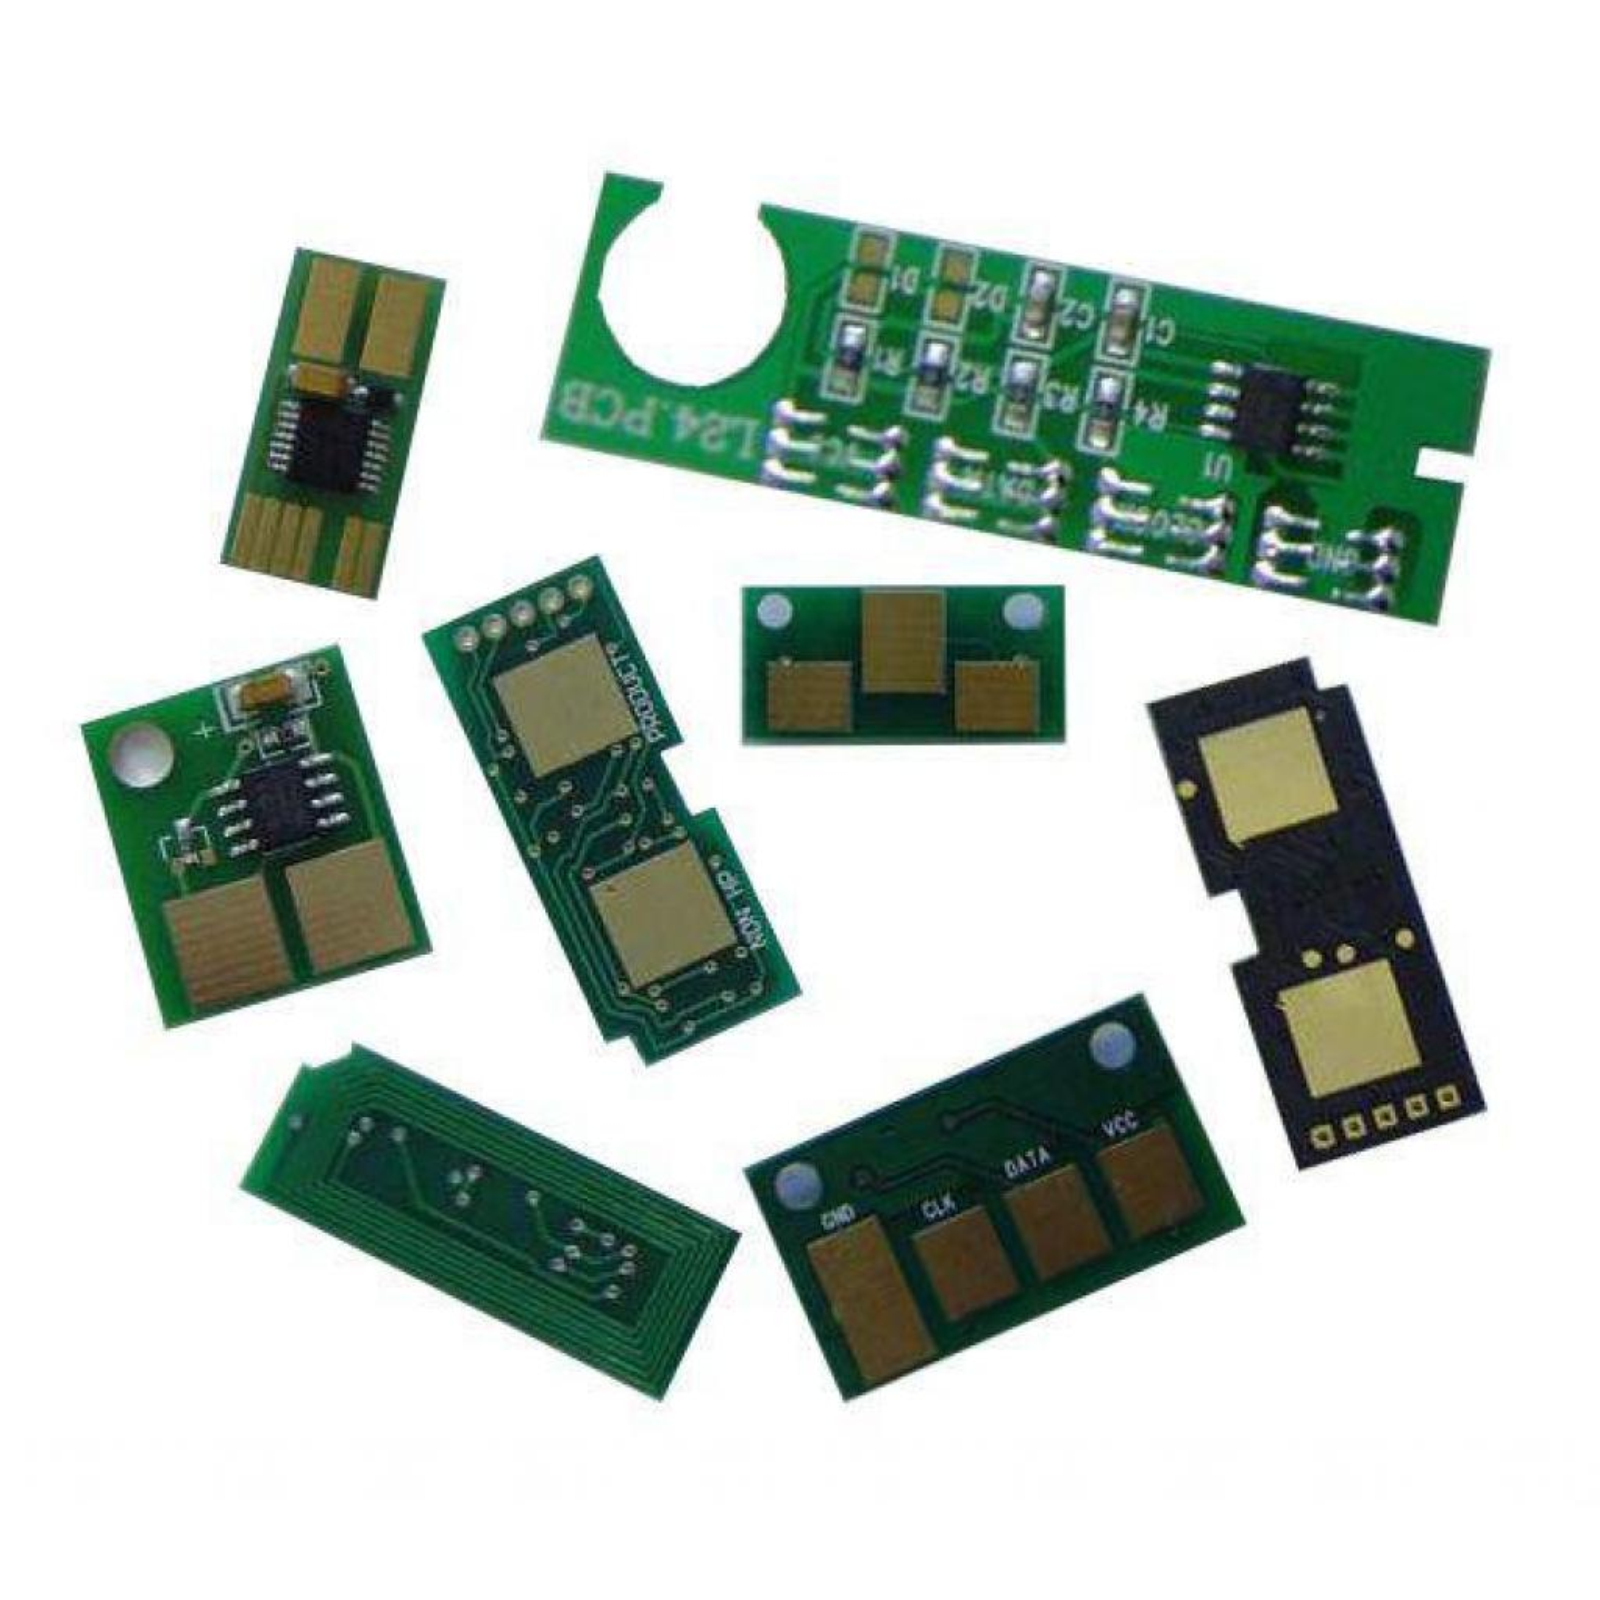 Чип для картриджа EPSON T0803 ДЛЯ R265/P50 MAGENTA Apex (CHIP-EPS-T0803-M)